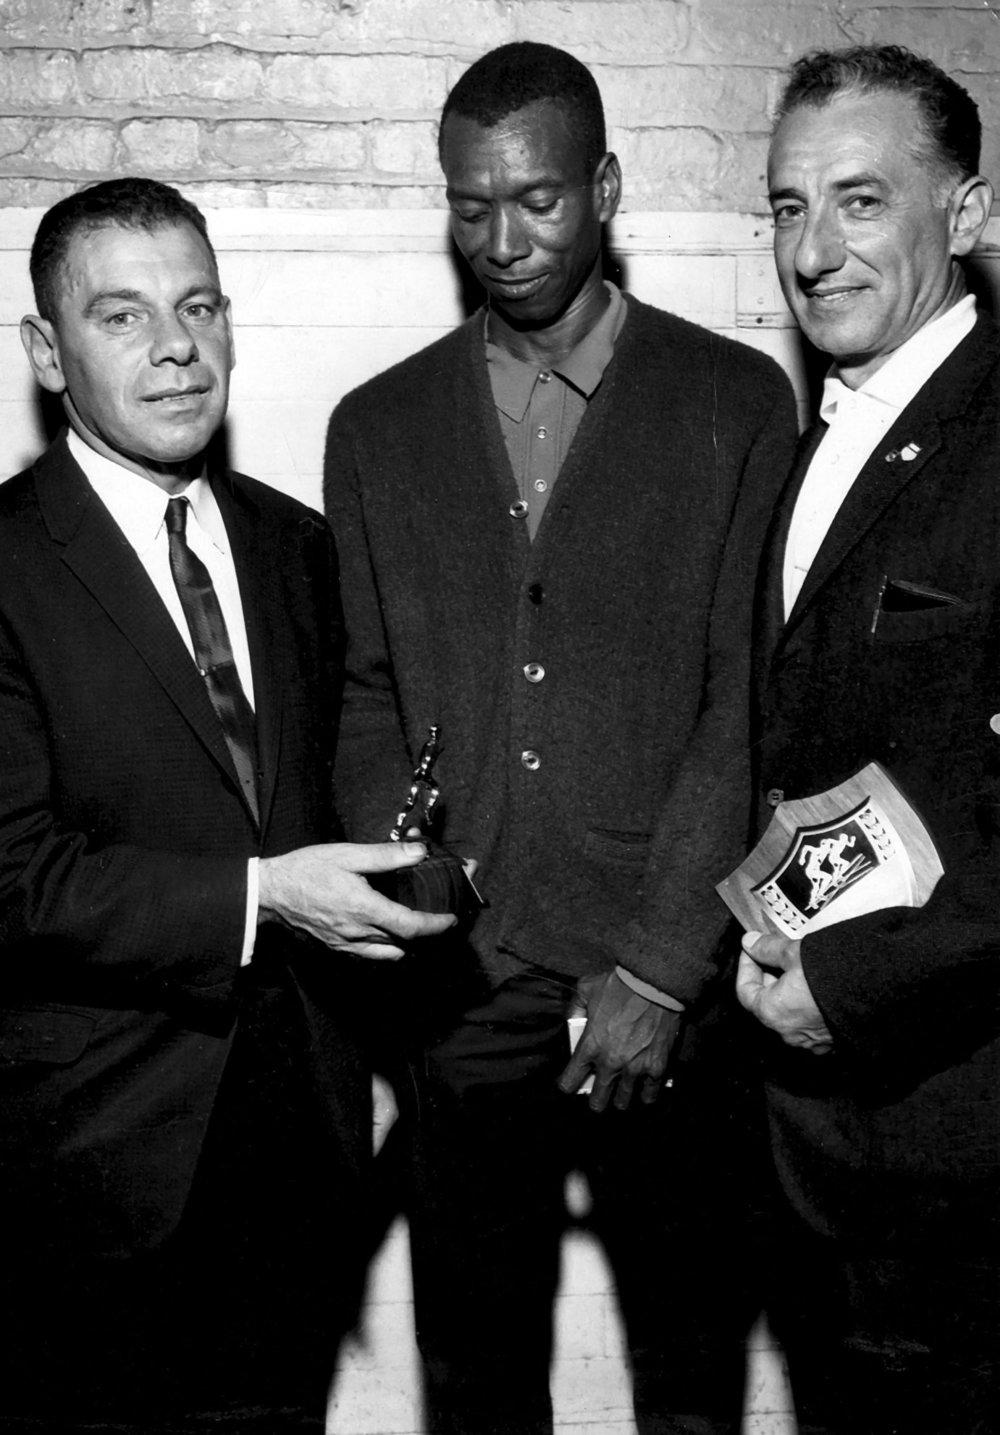 Founding members Kurt Steiner, Ted Corbitt (president 1958-60), and Aldo Scandurra (president 1964-66).